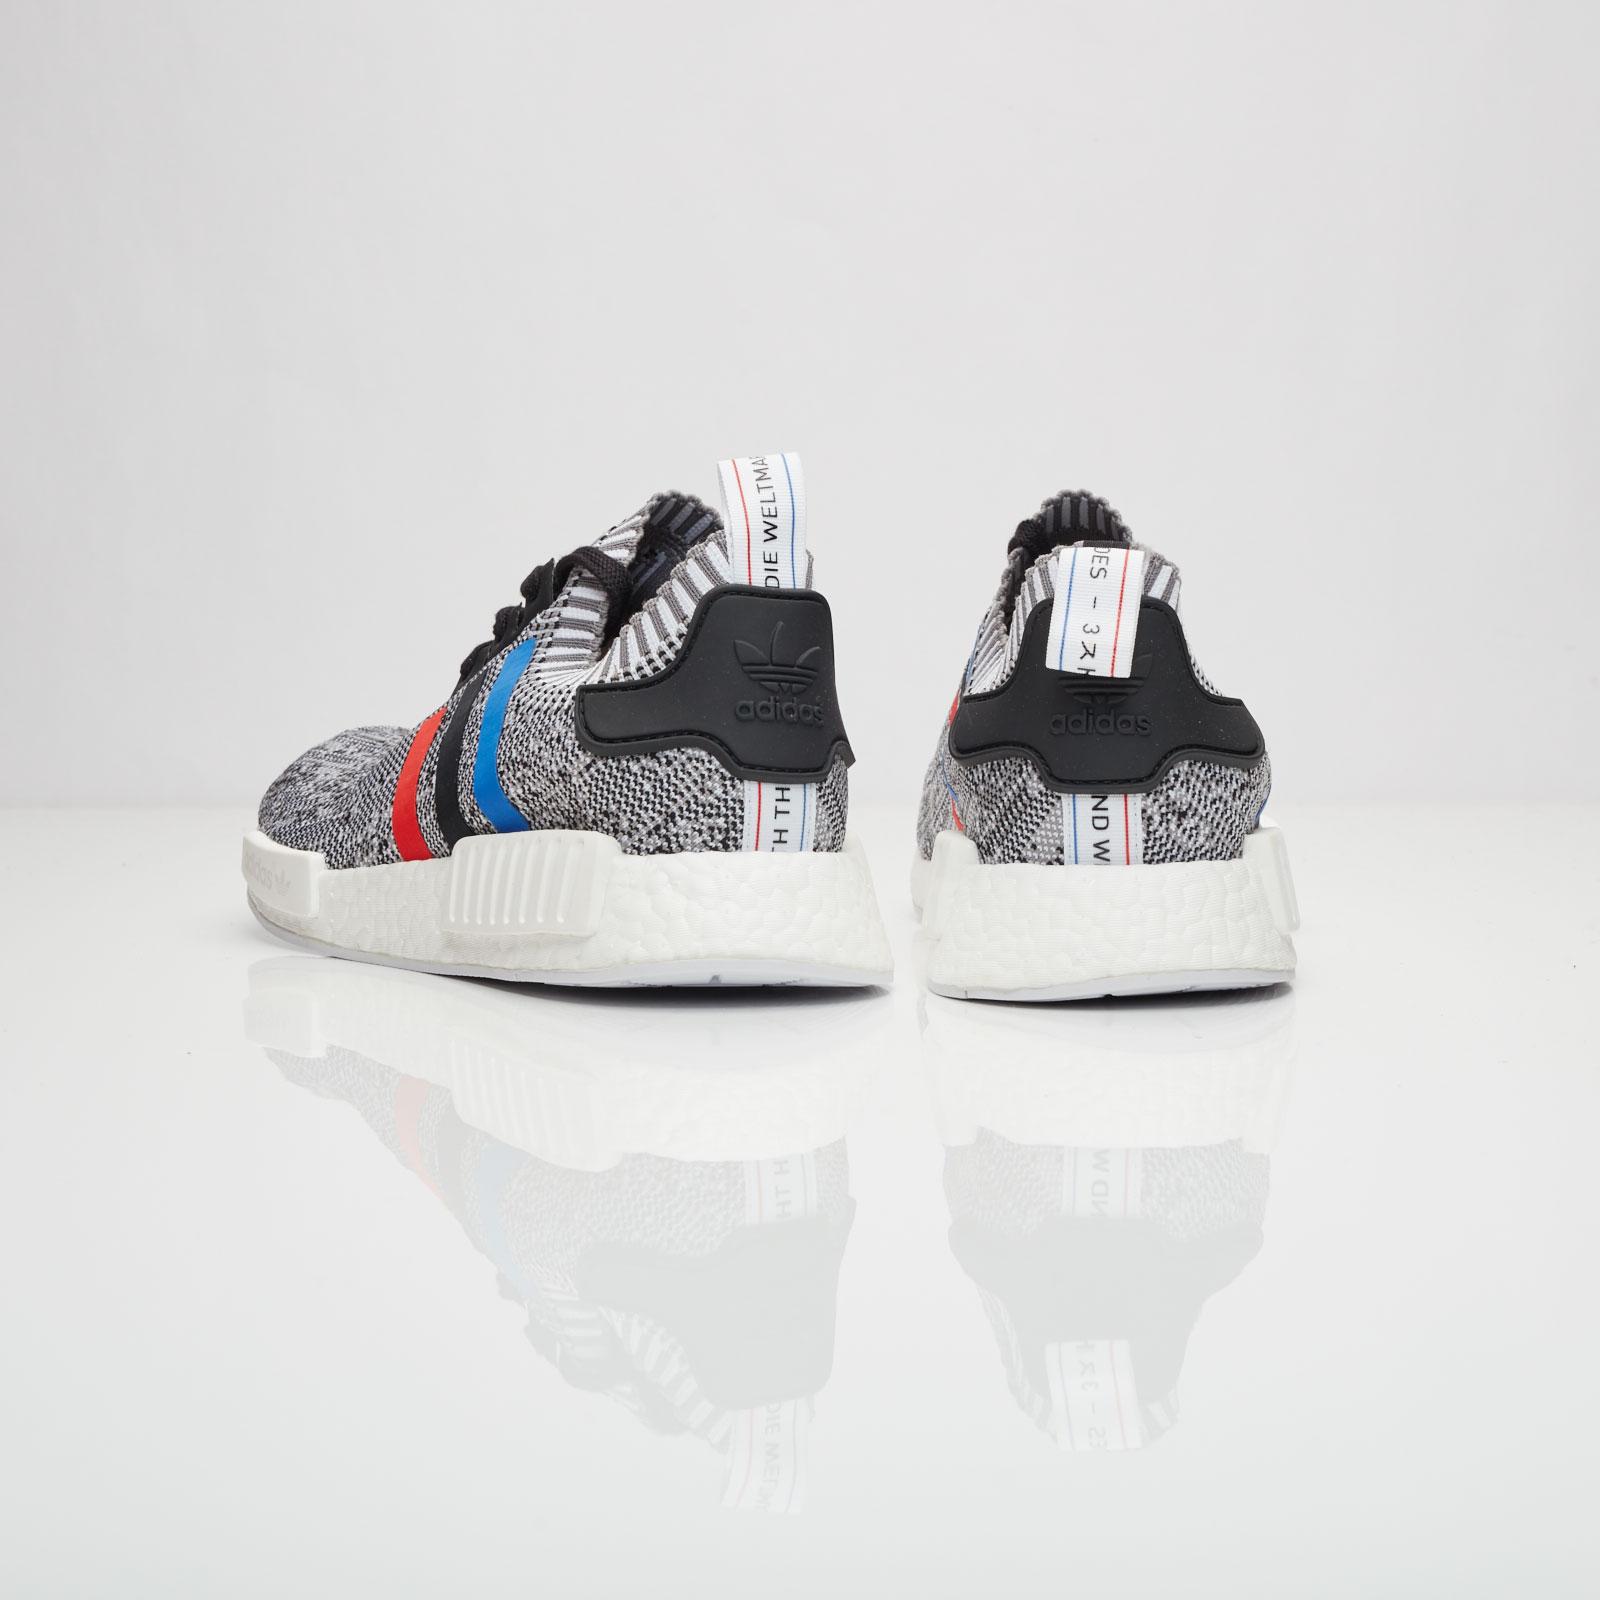 bd209993204be adidas NMD R1 PK - Bb2888 - Sneakersnstuff